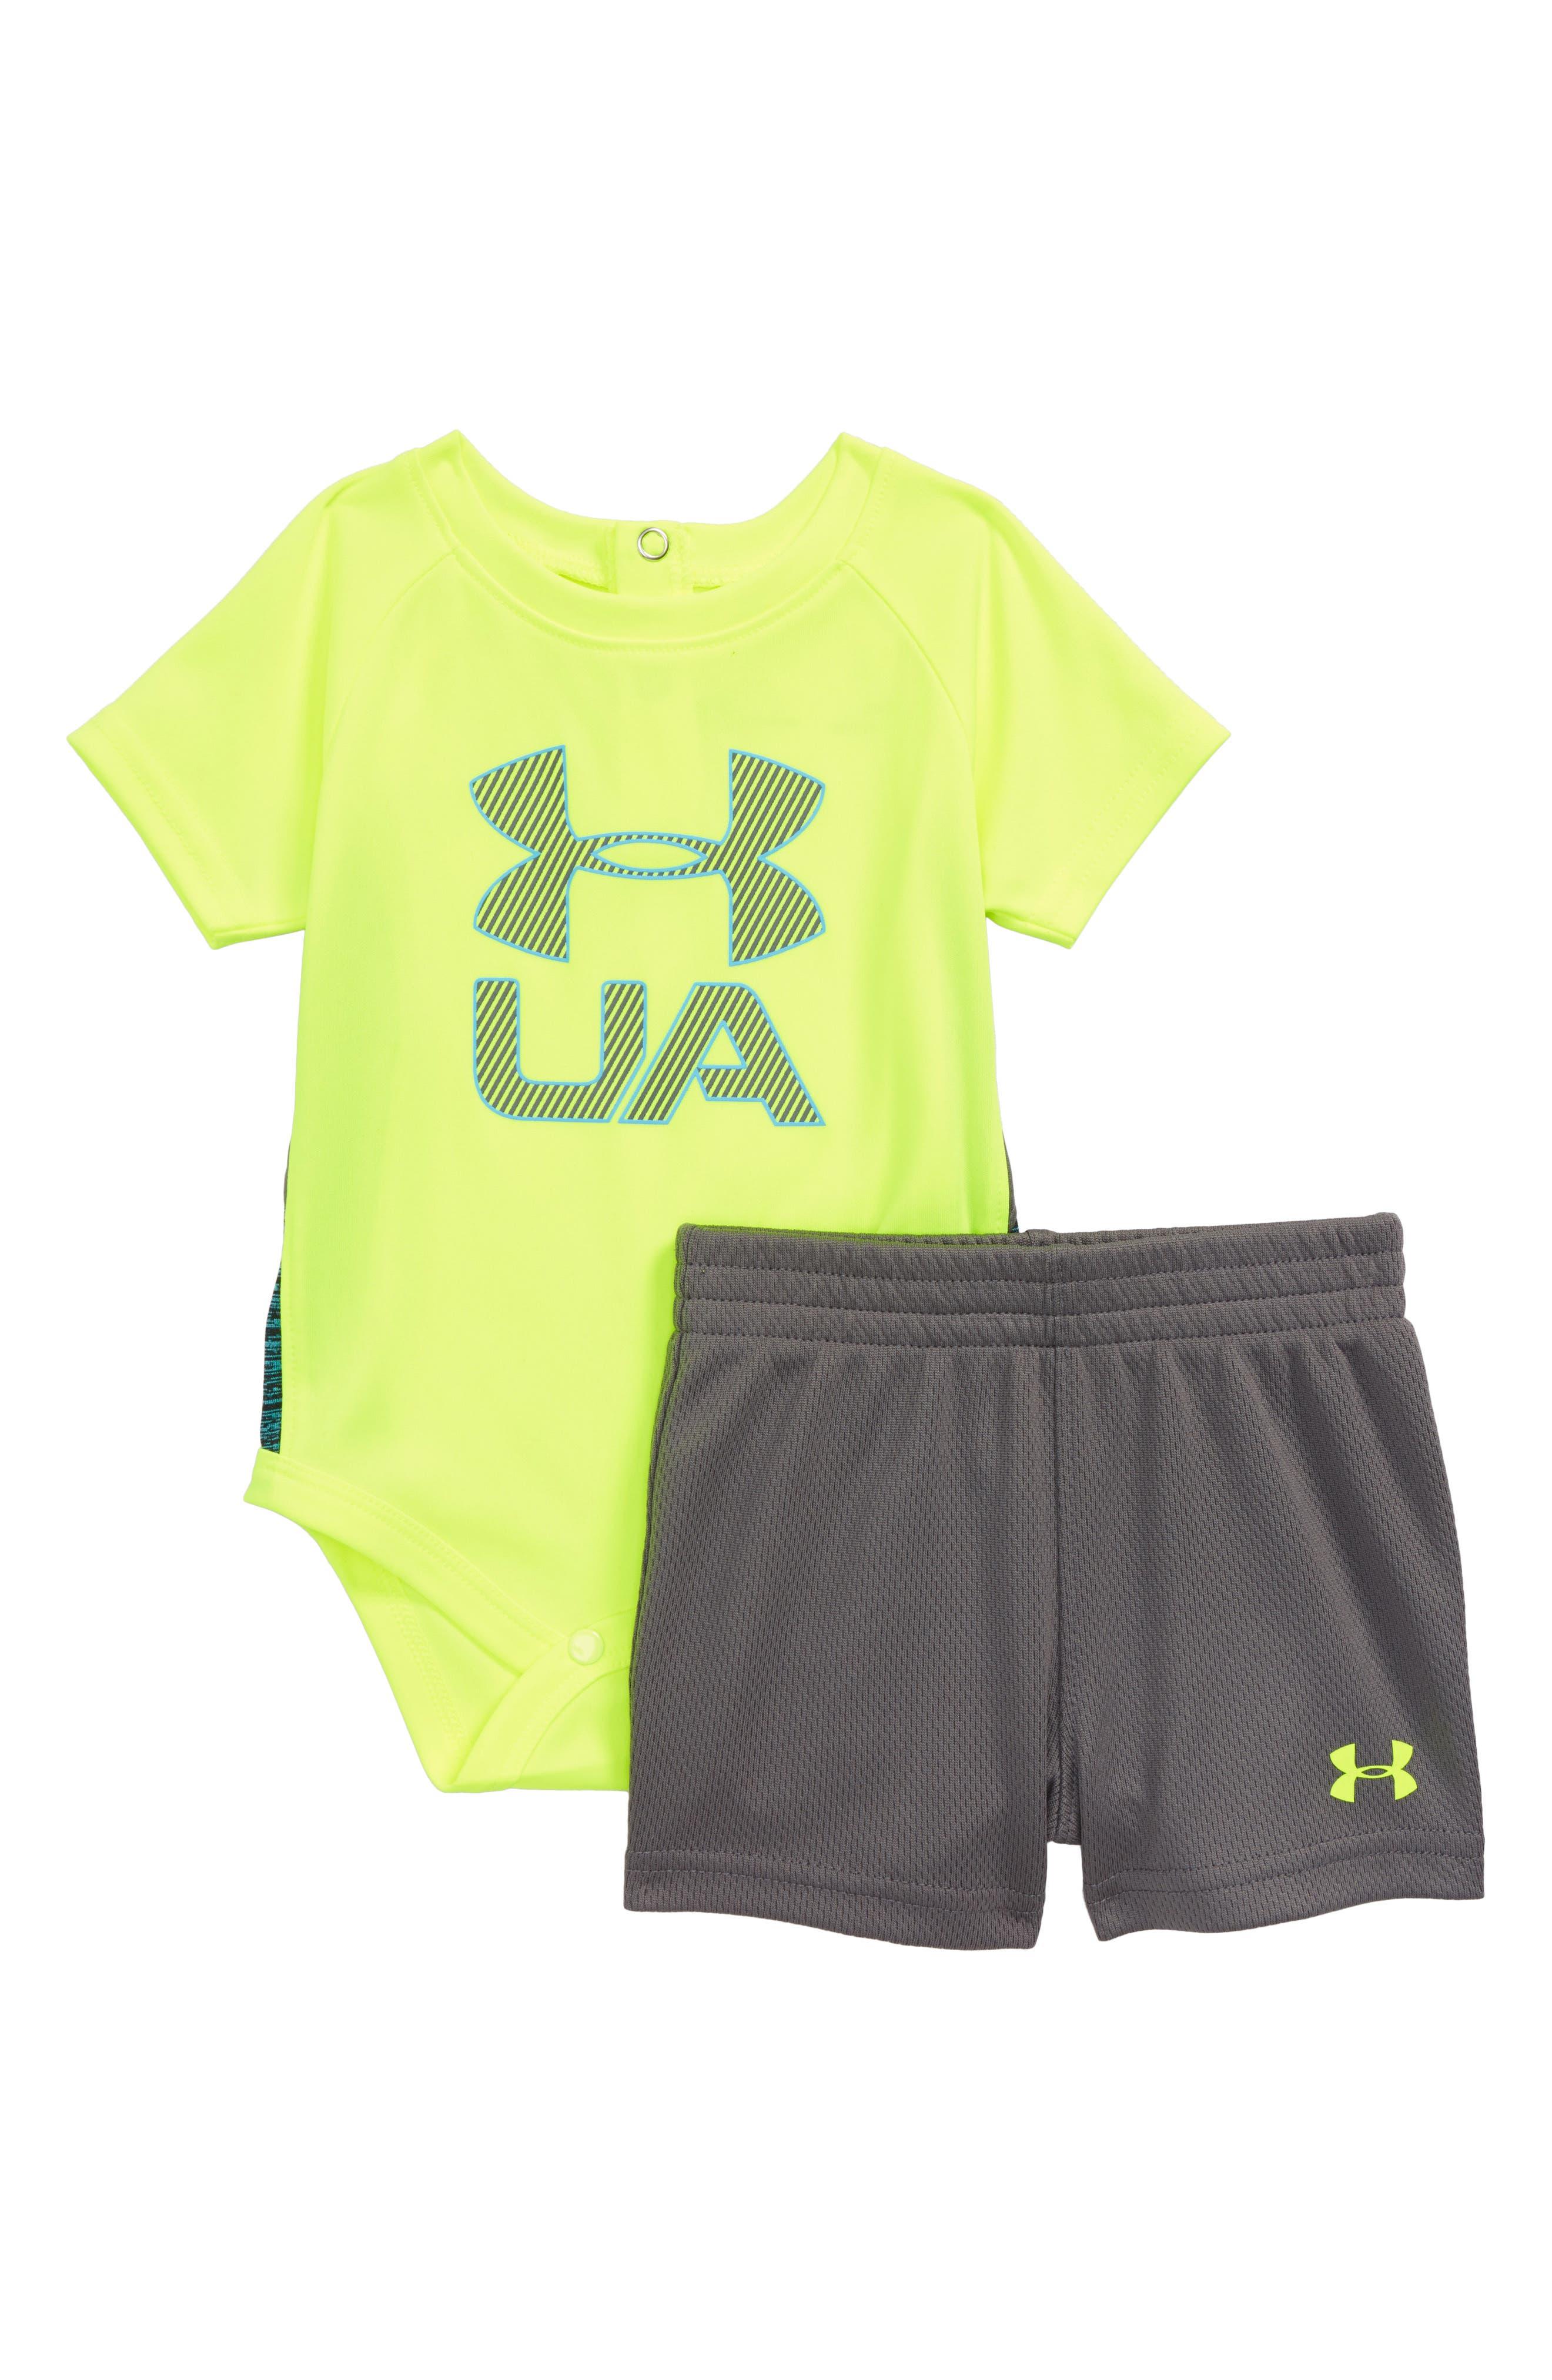 Sportster Bodysuit & Shorts Set,                         Main,                         color, Hi Vis Yellow